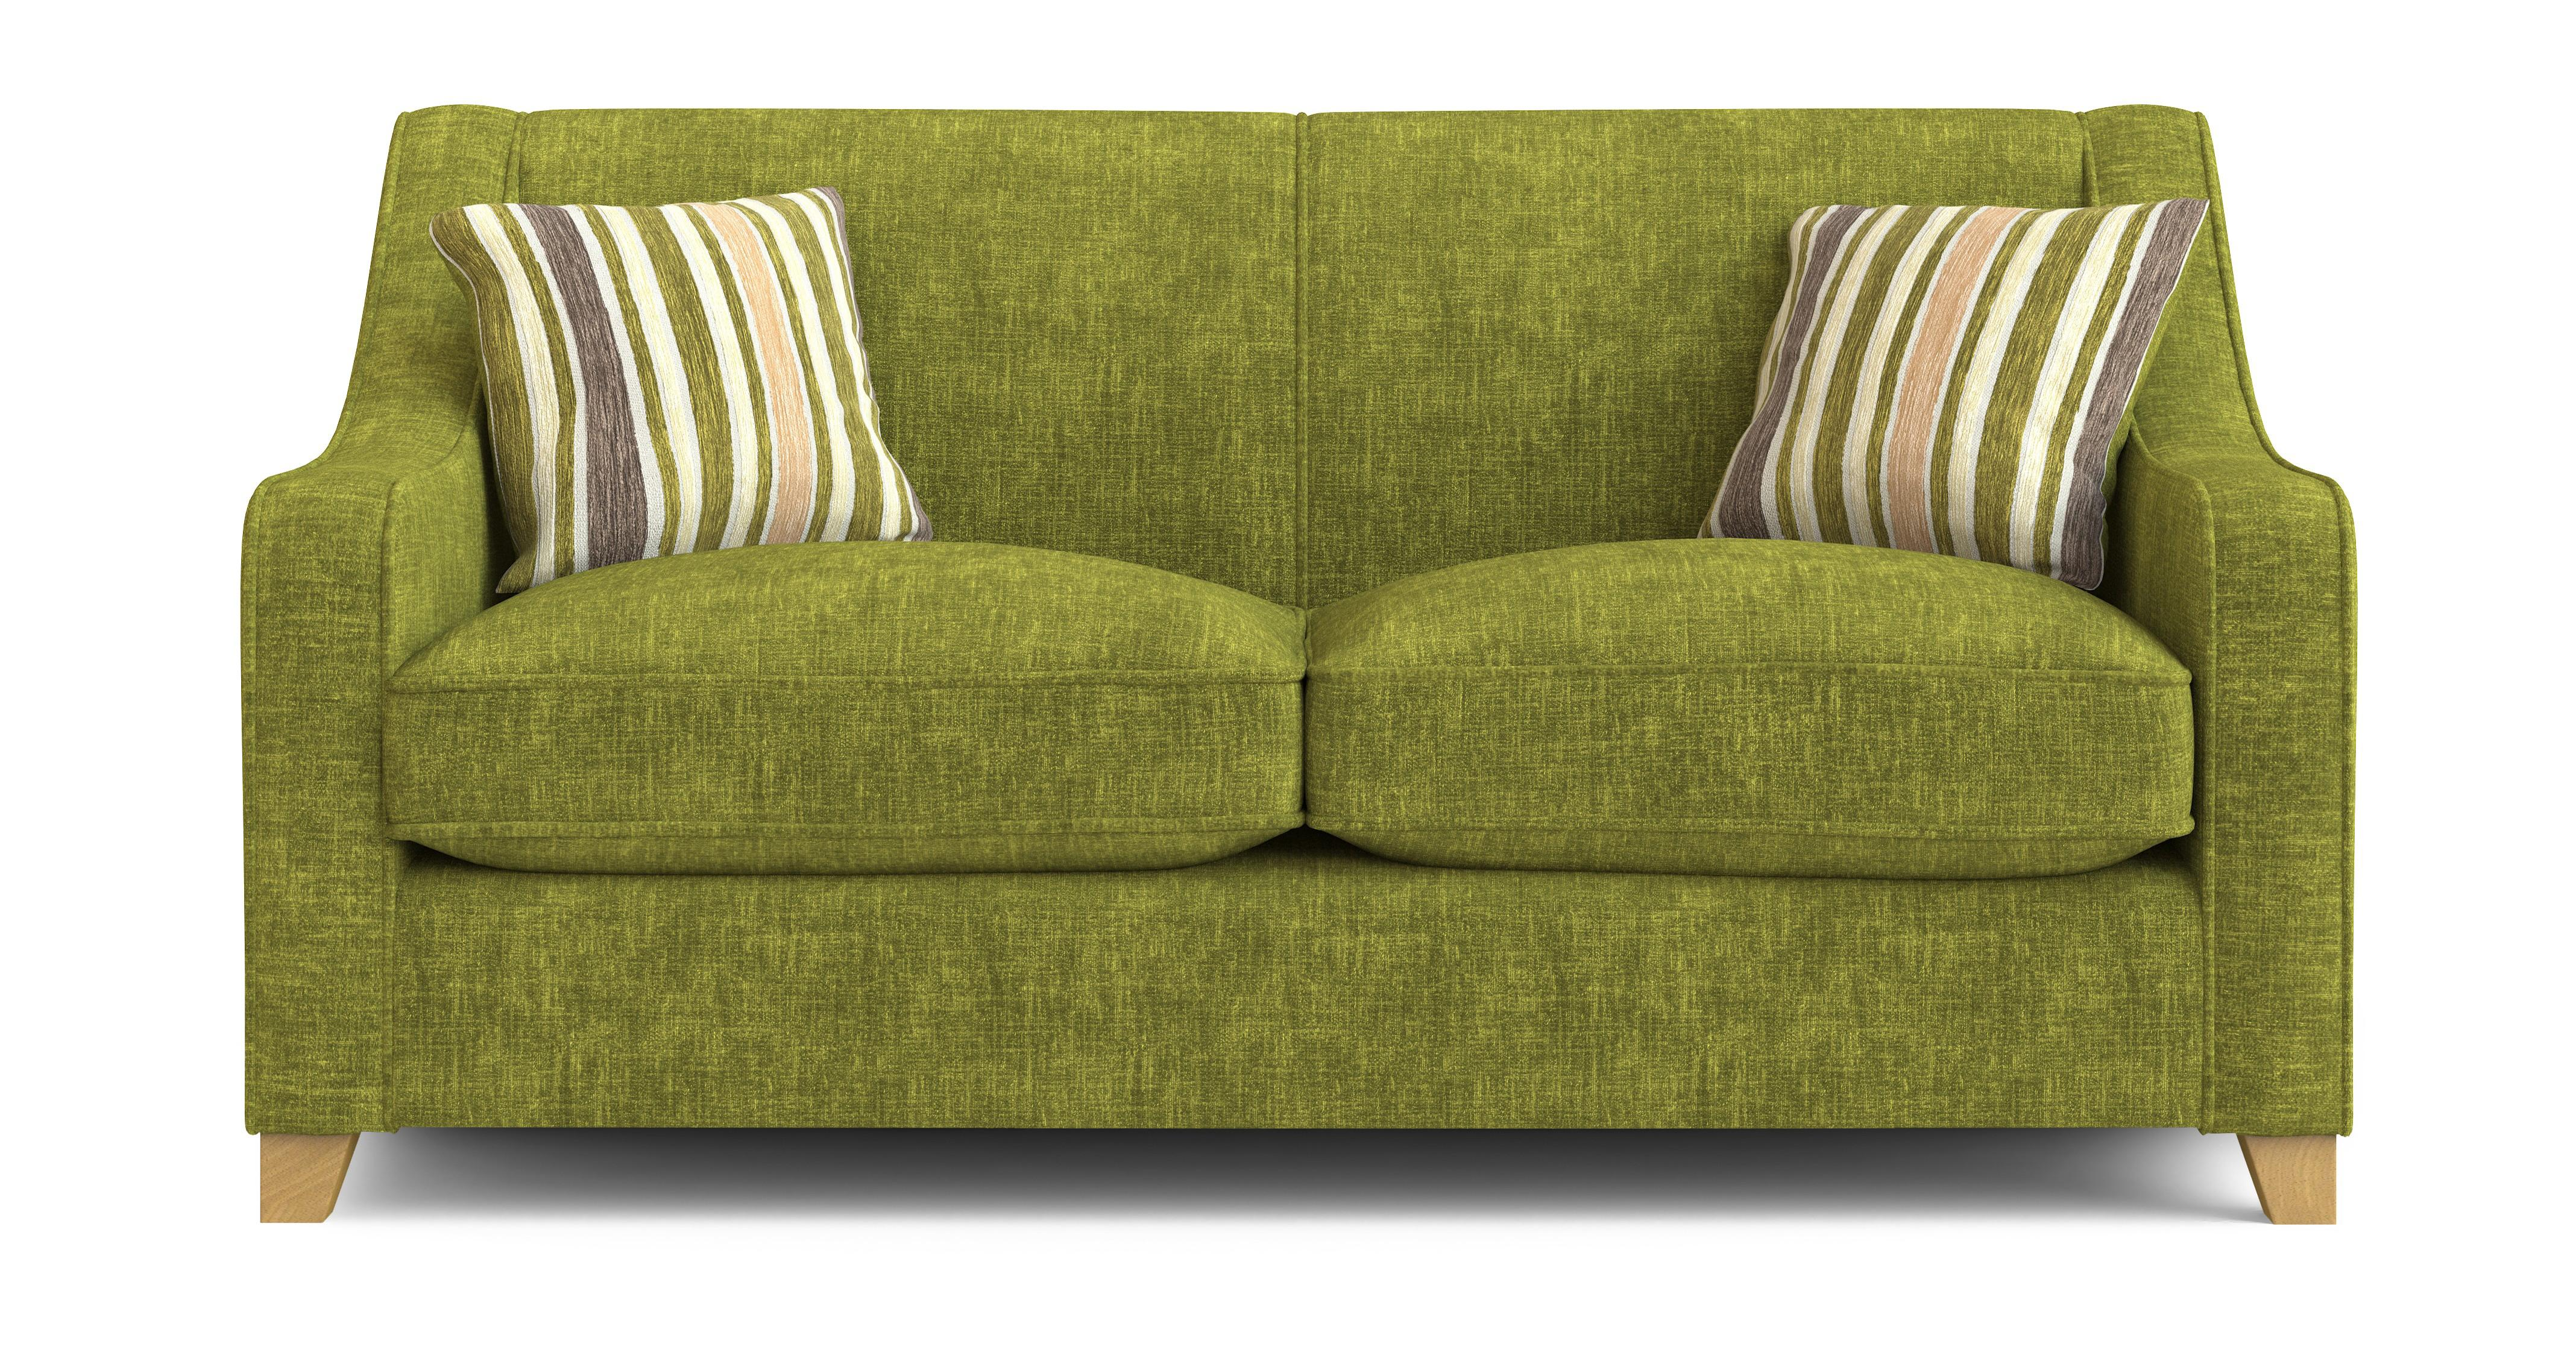 2 seater sofa HZMDTLC